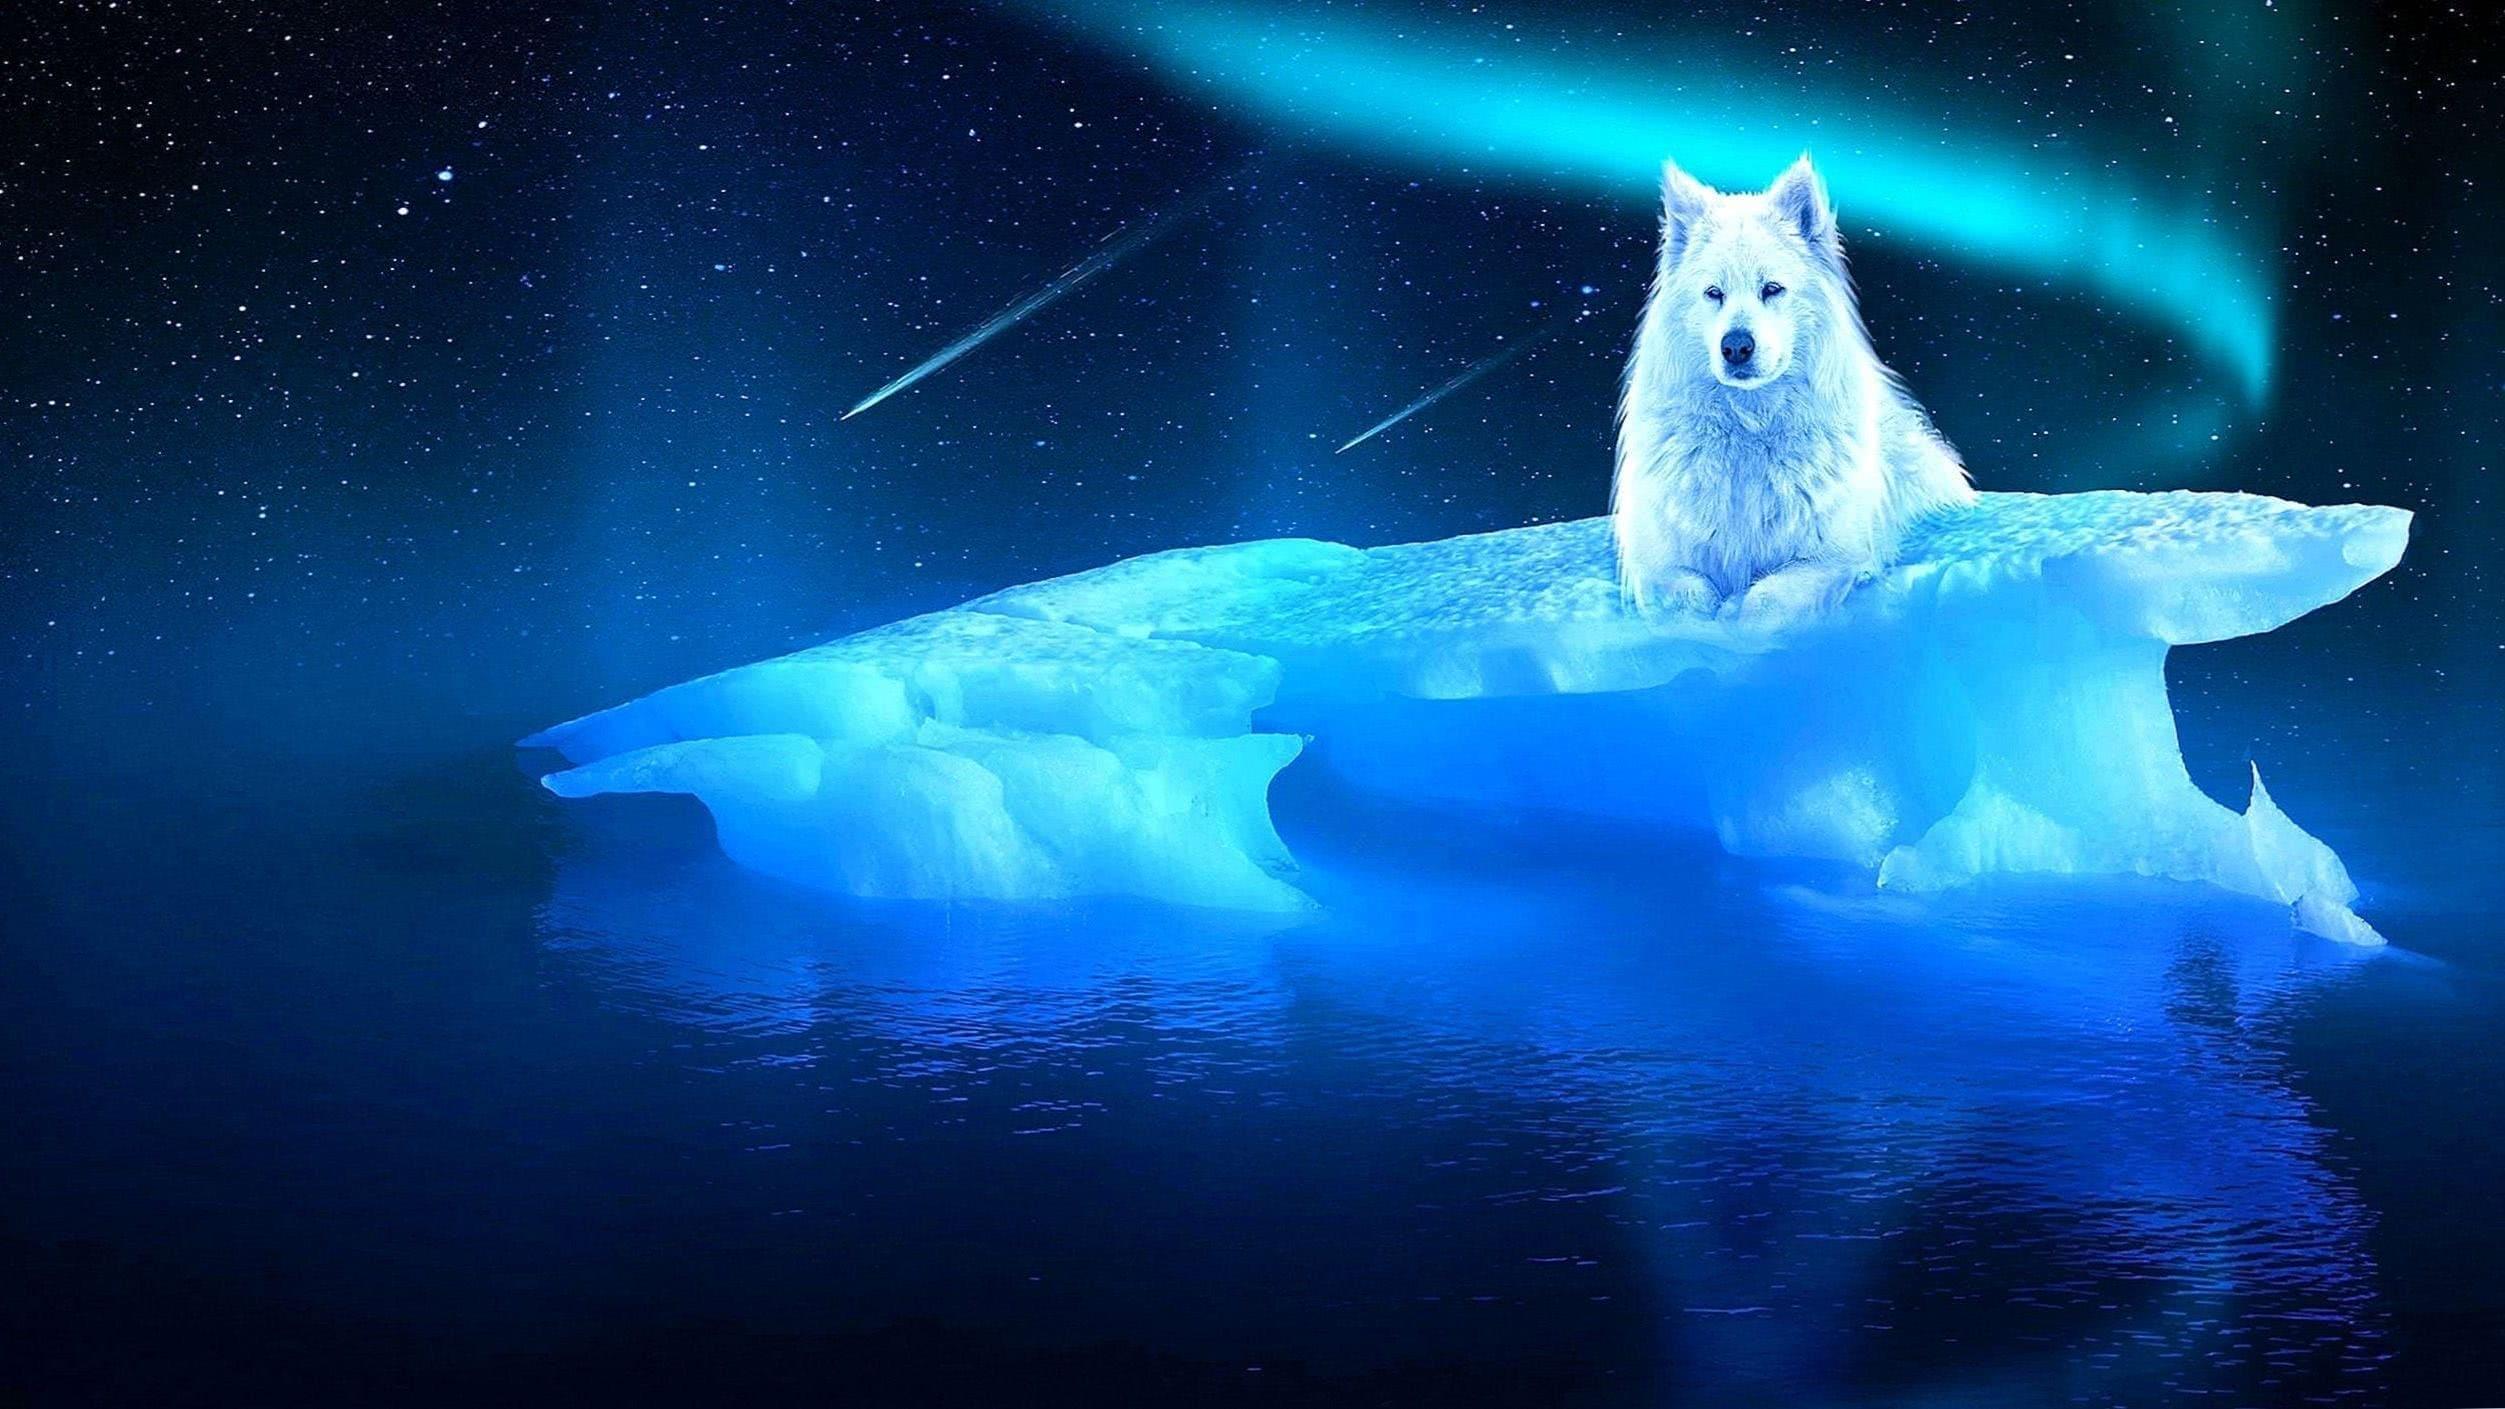 Fantasy Ice Wolf Wallpaper